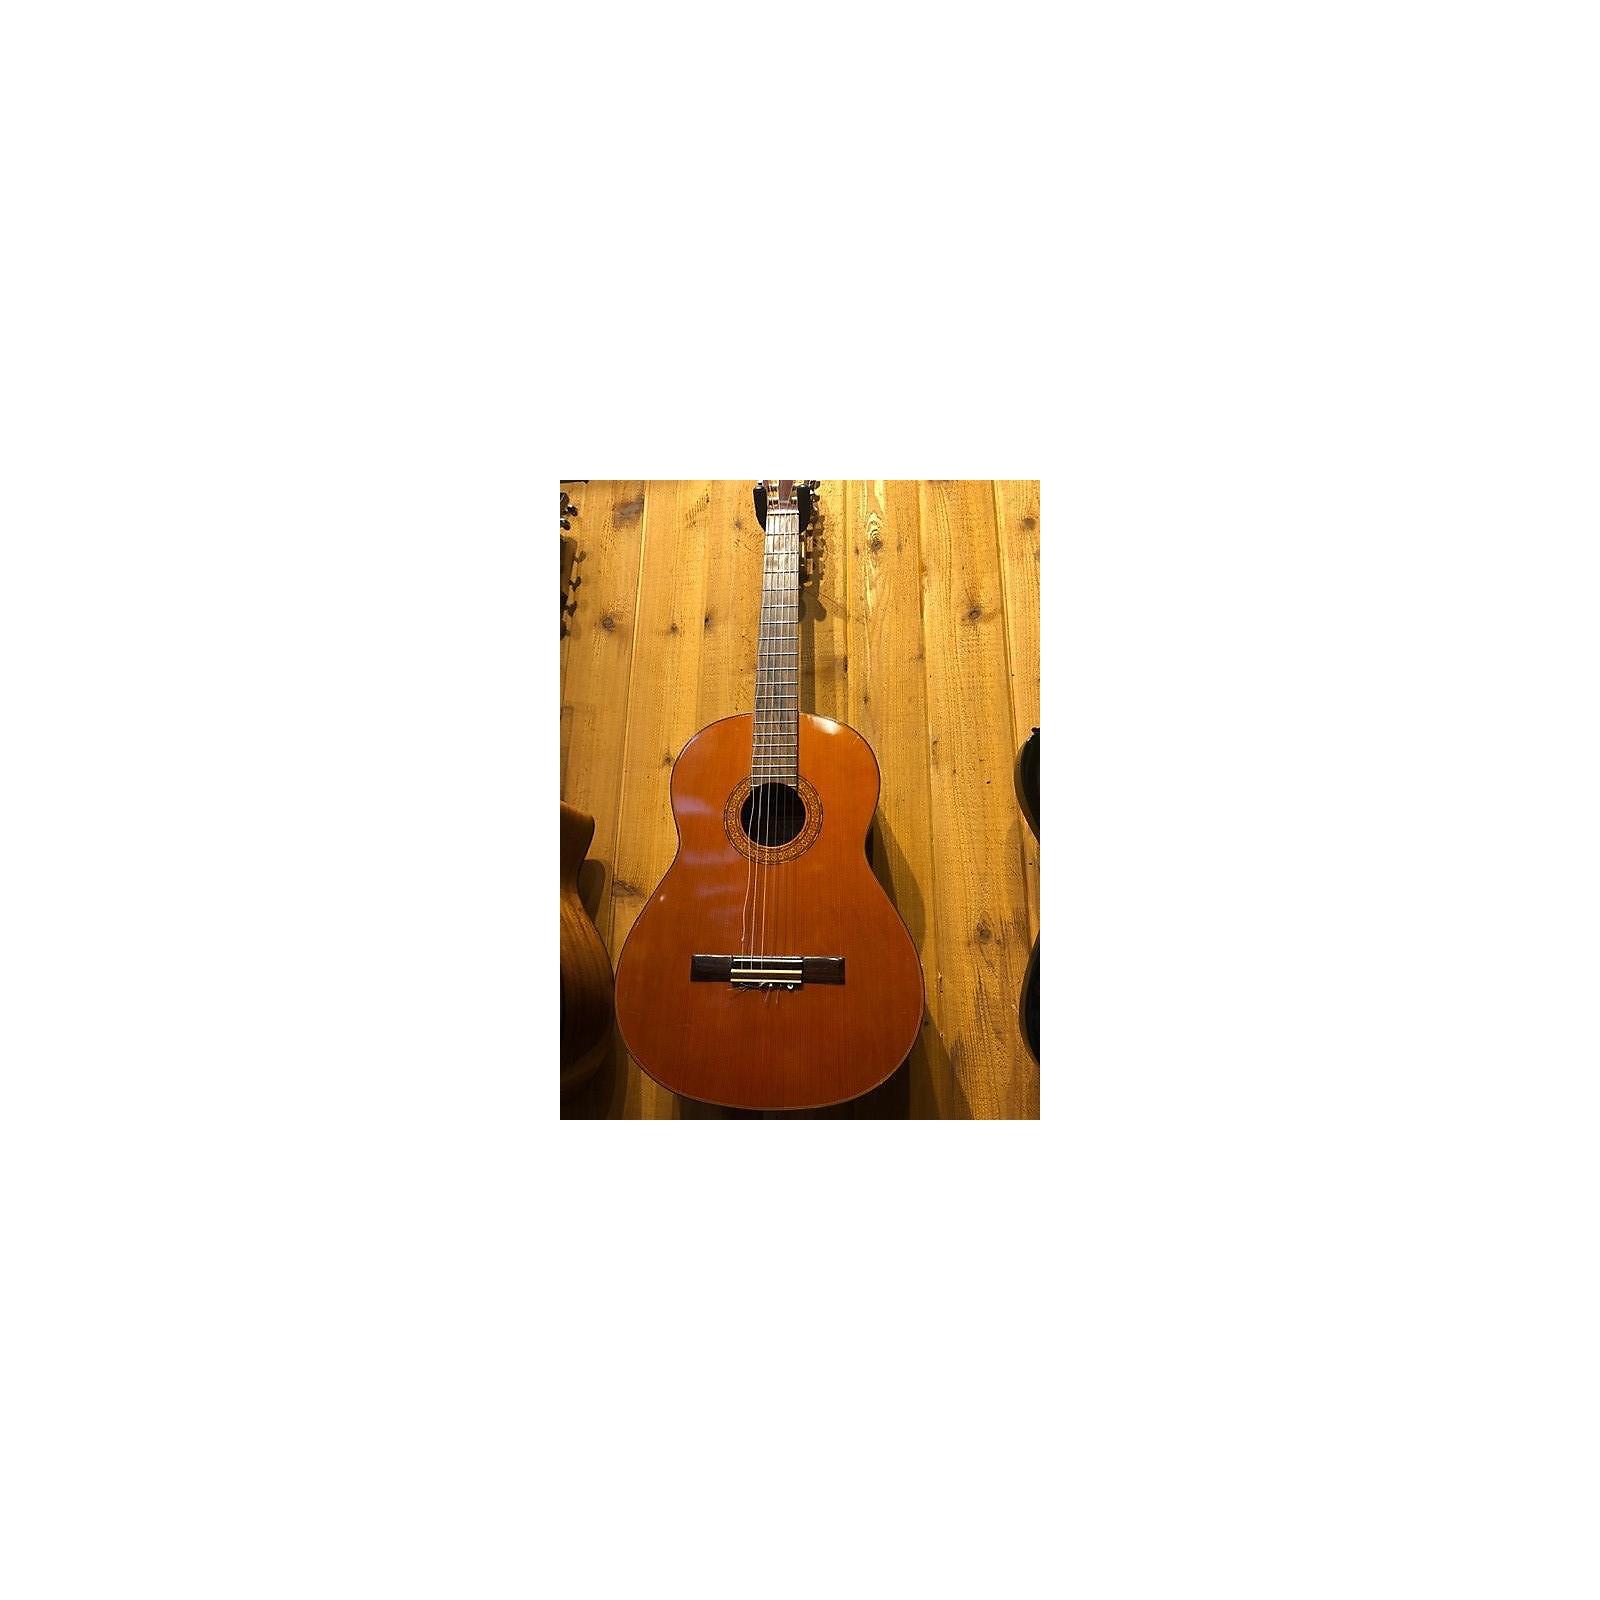 Ventura F-1586 Classical Acoustic Guitar